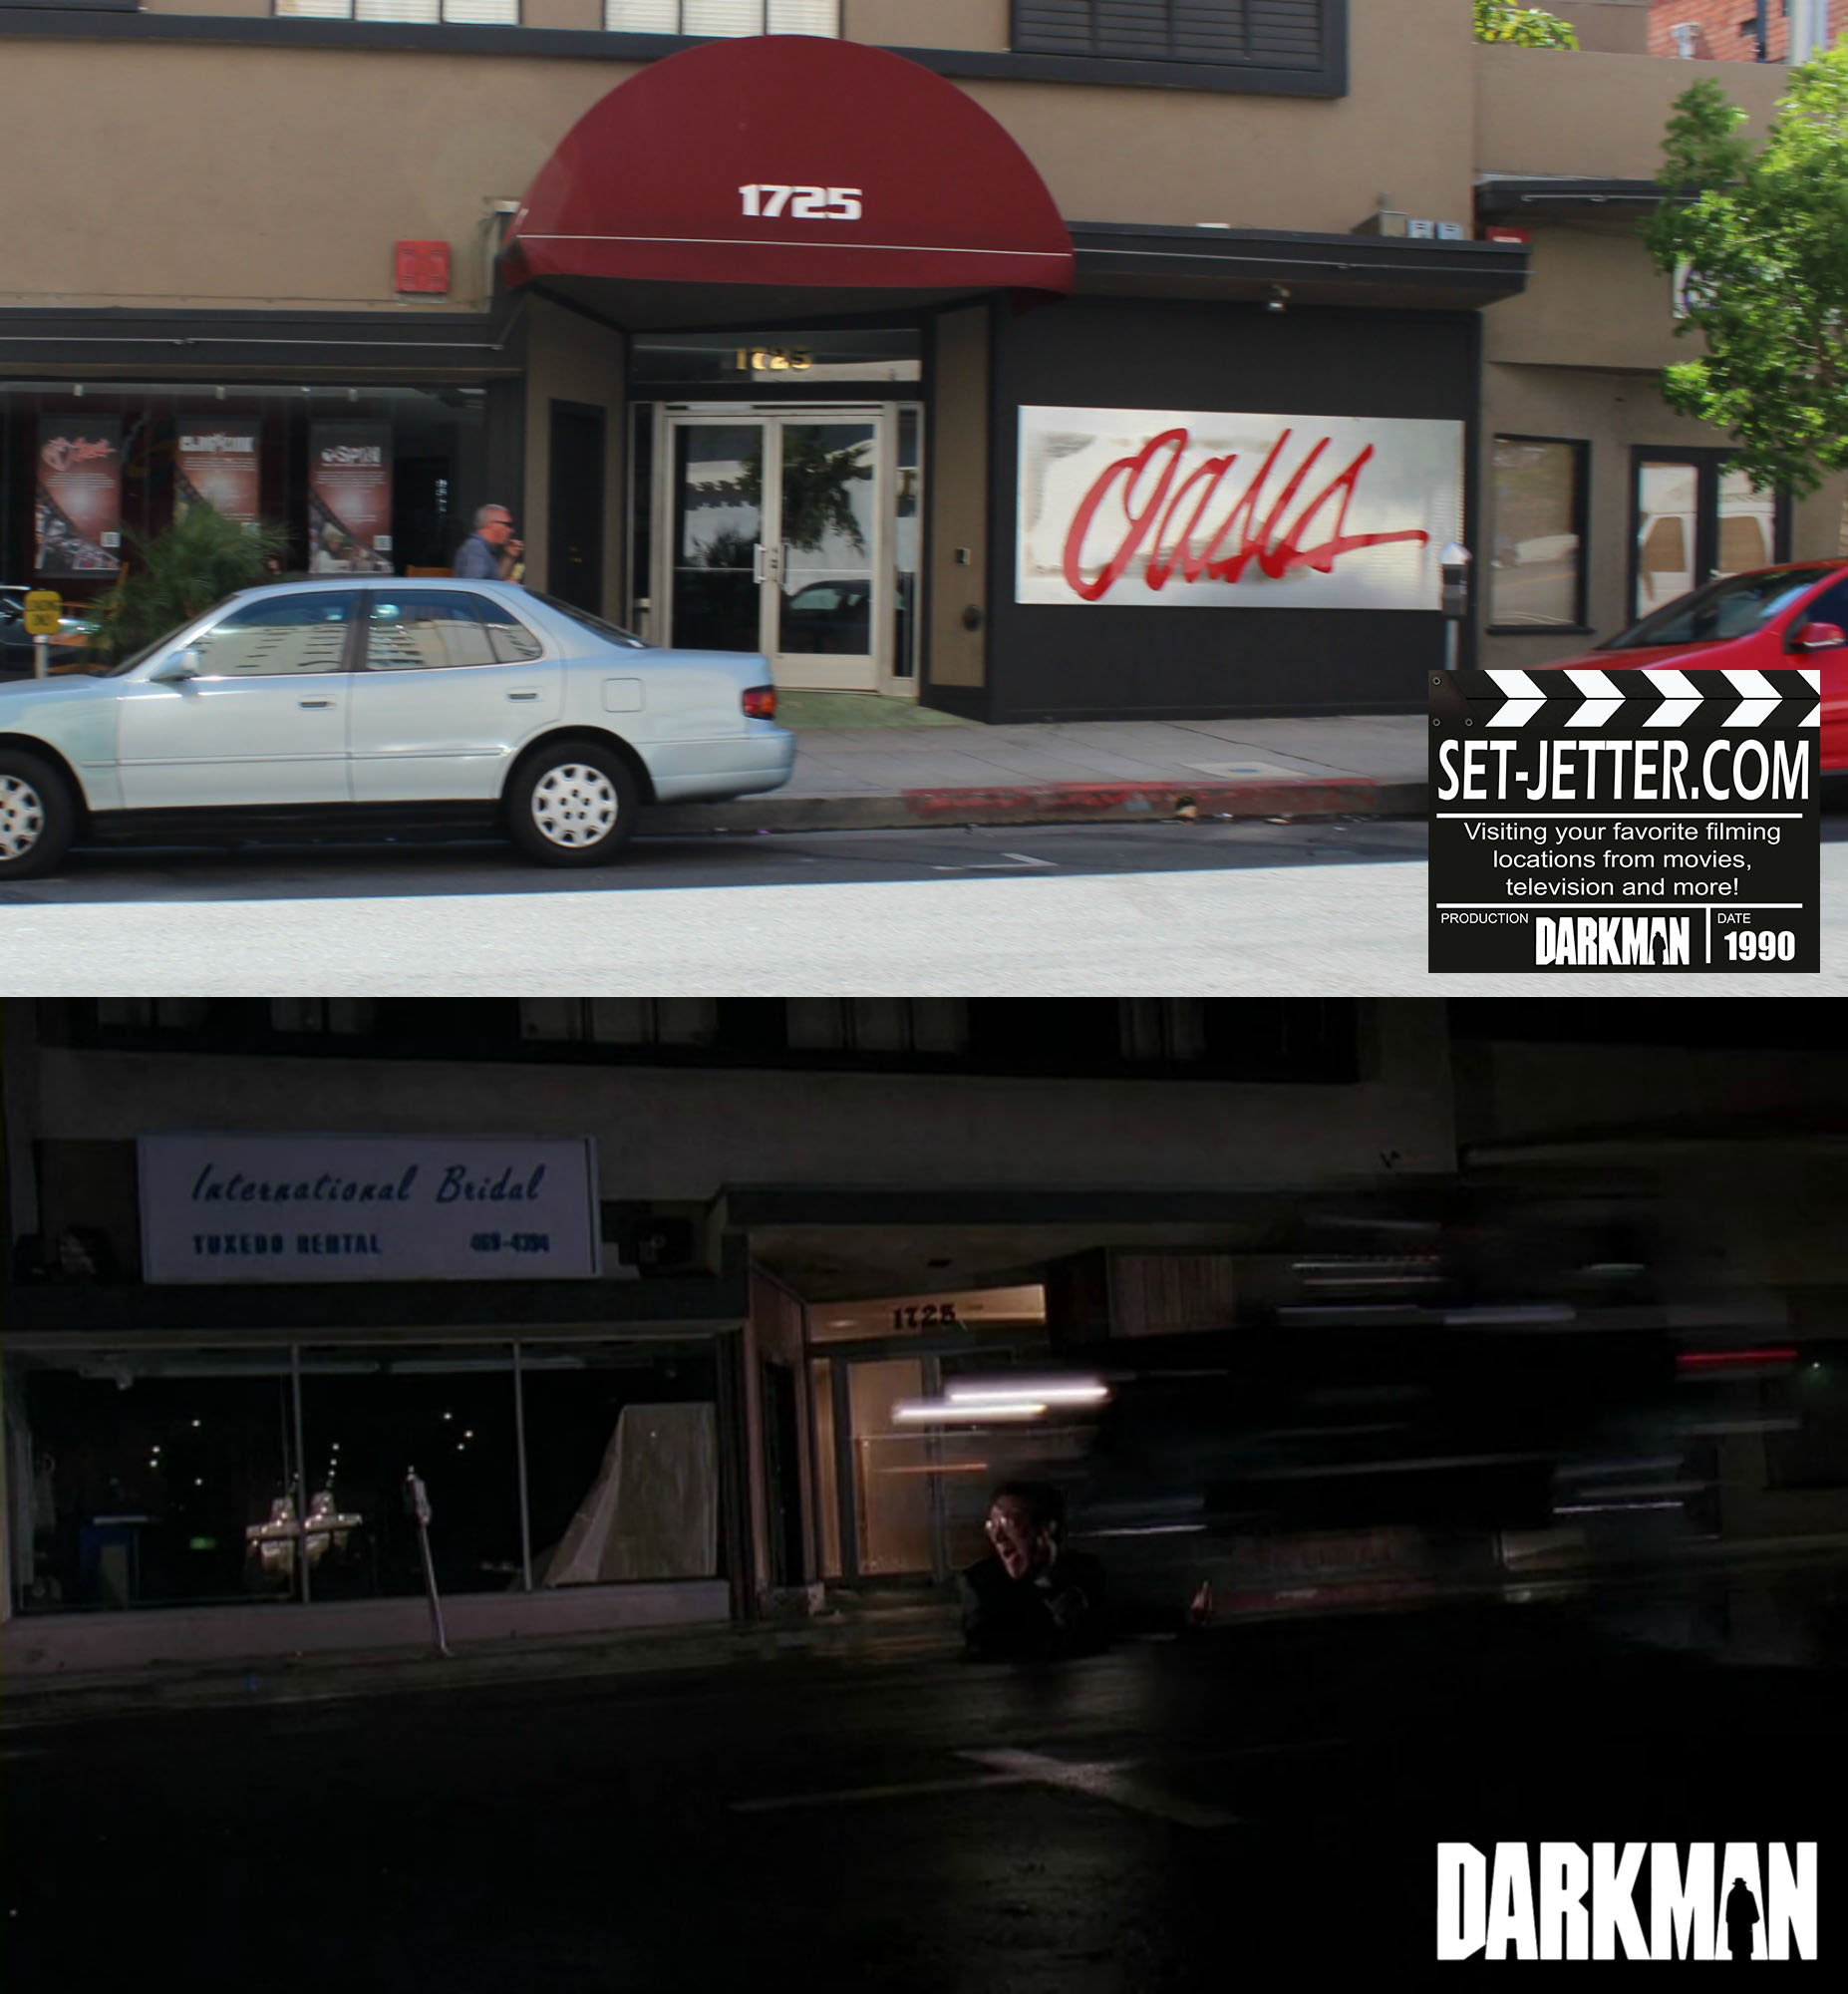 Darkman 10.jpg